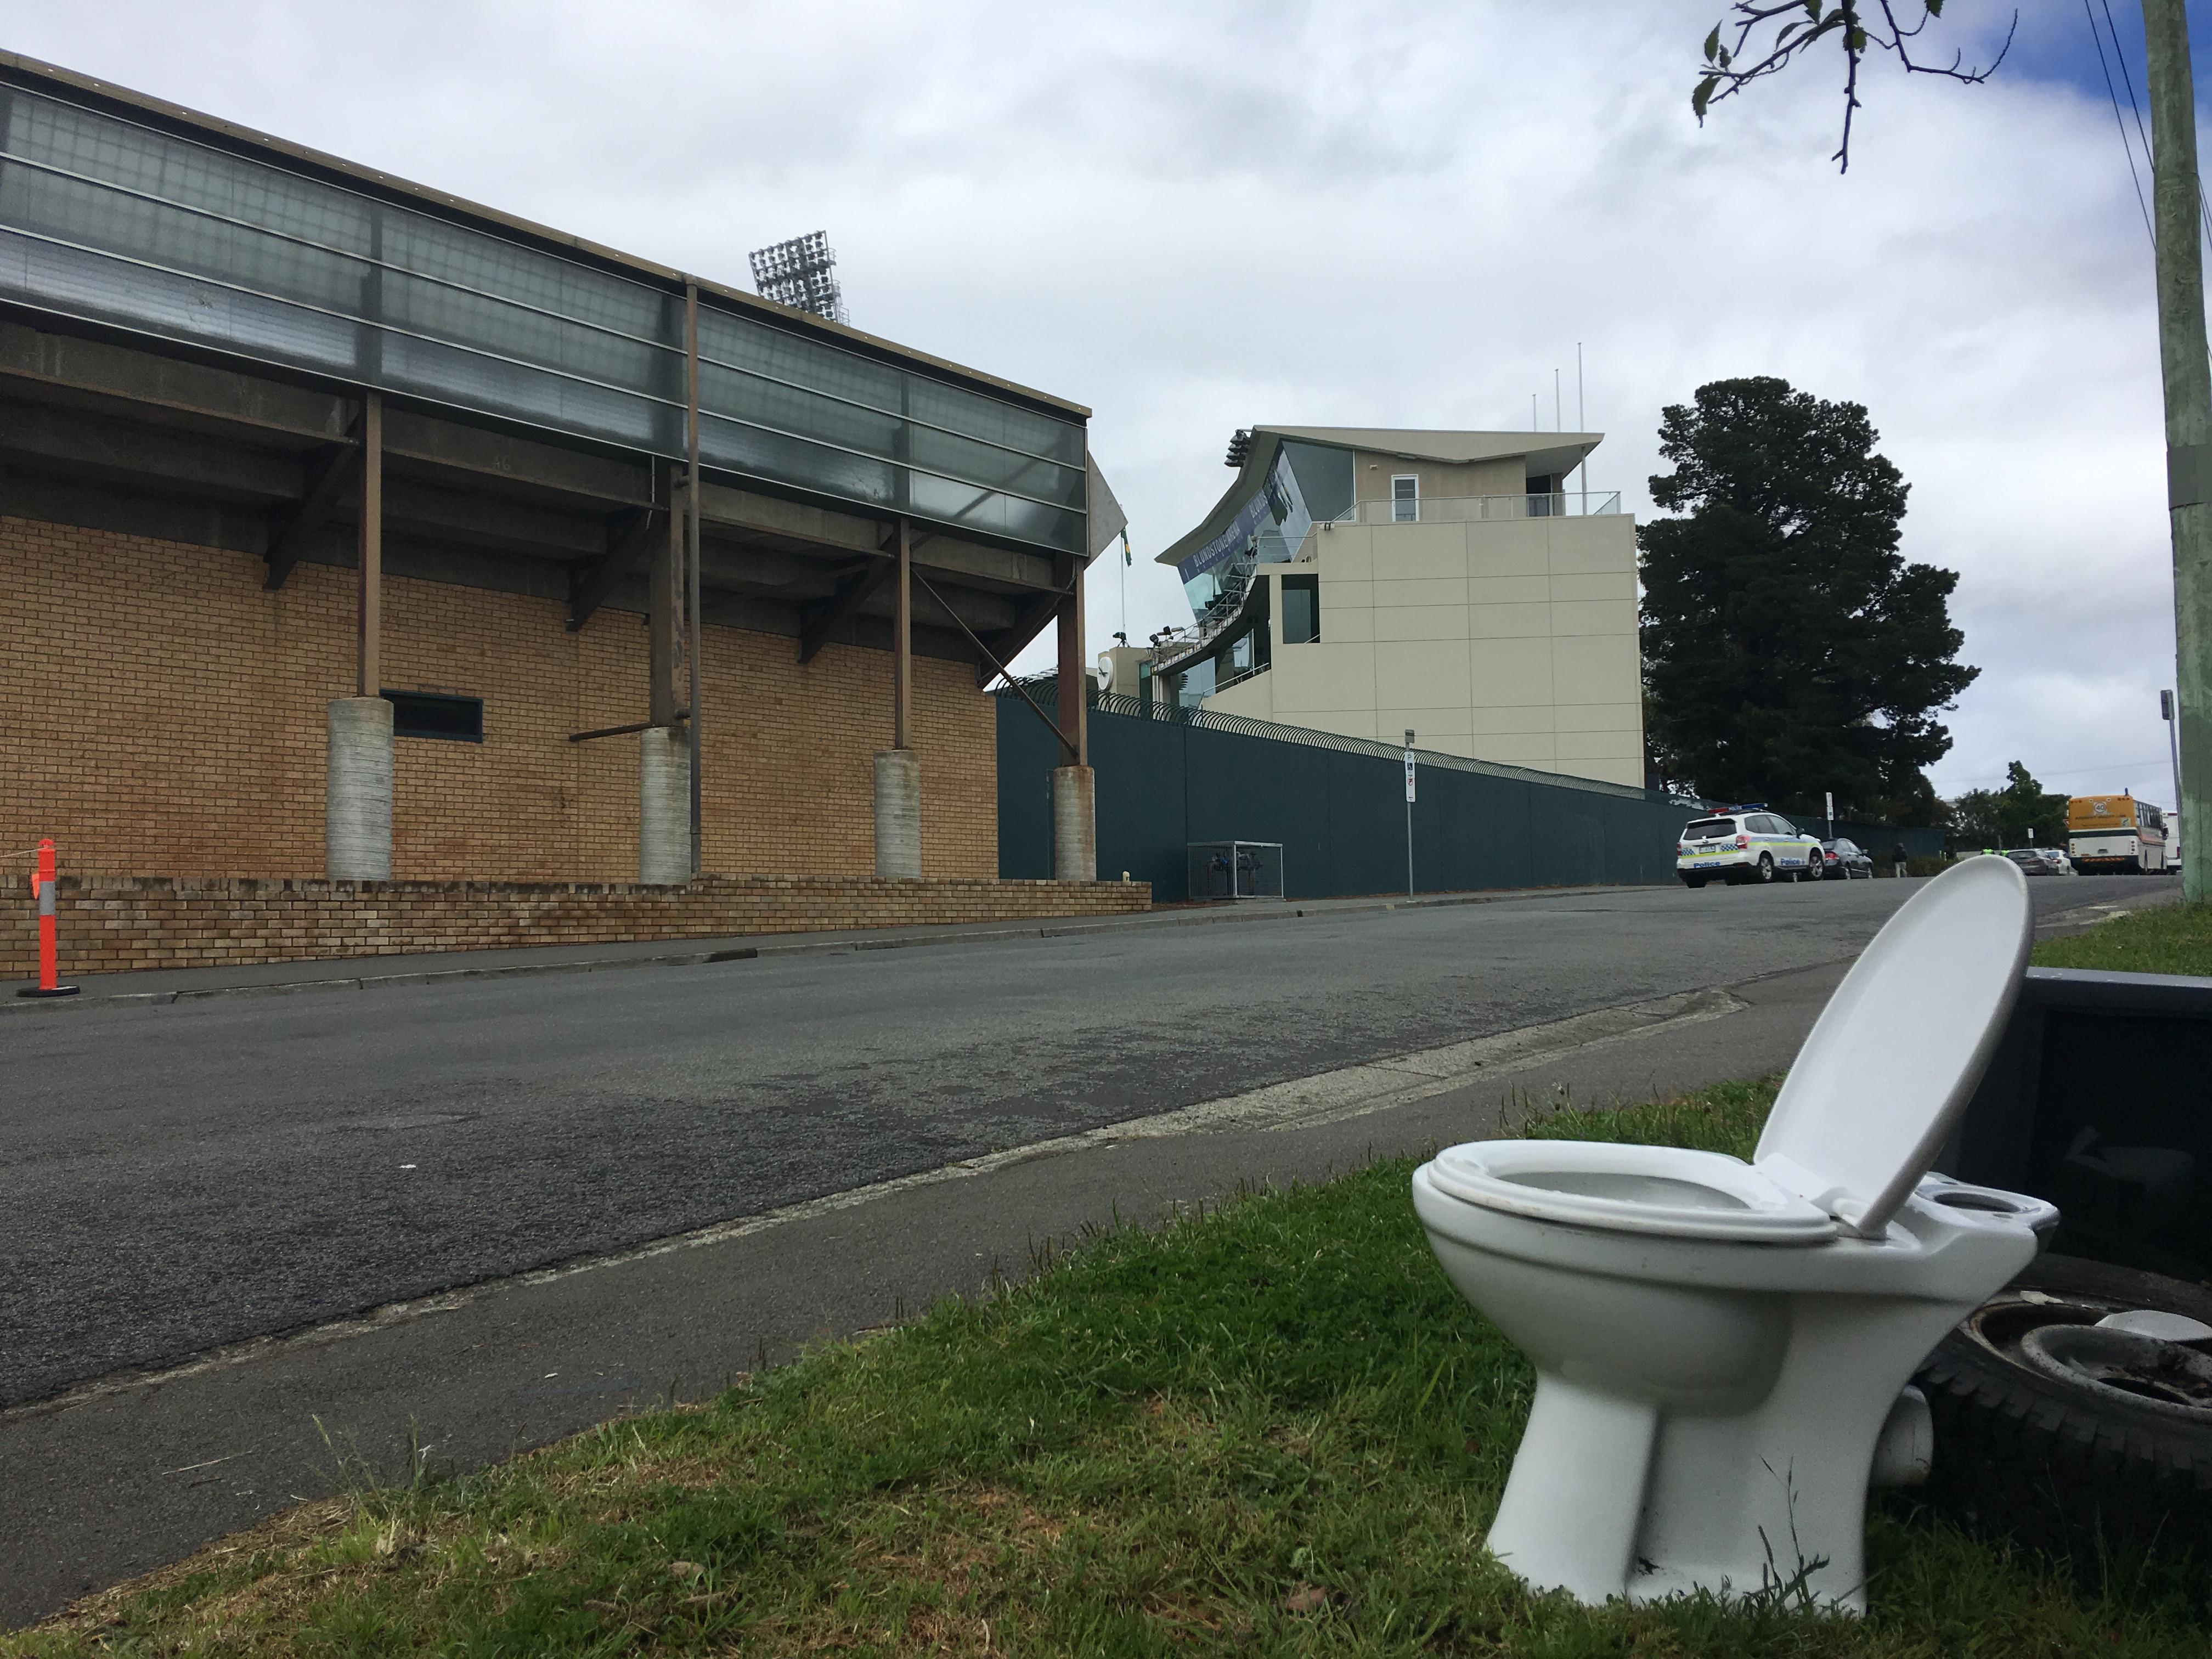 Bellerive Oval facilities (photo: Geoff Lemon)